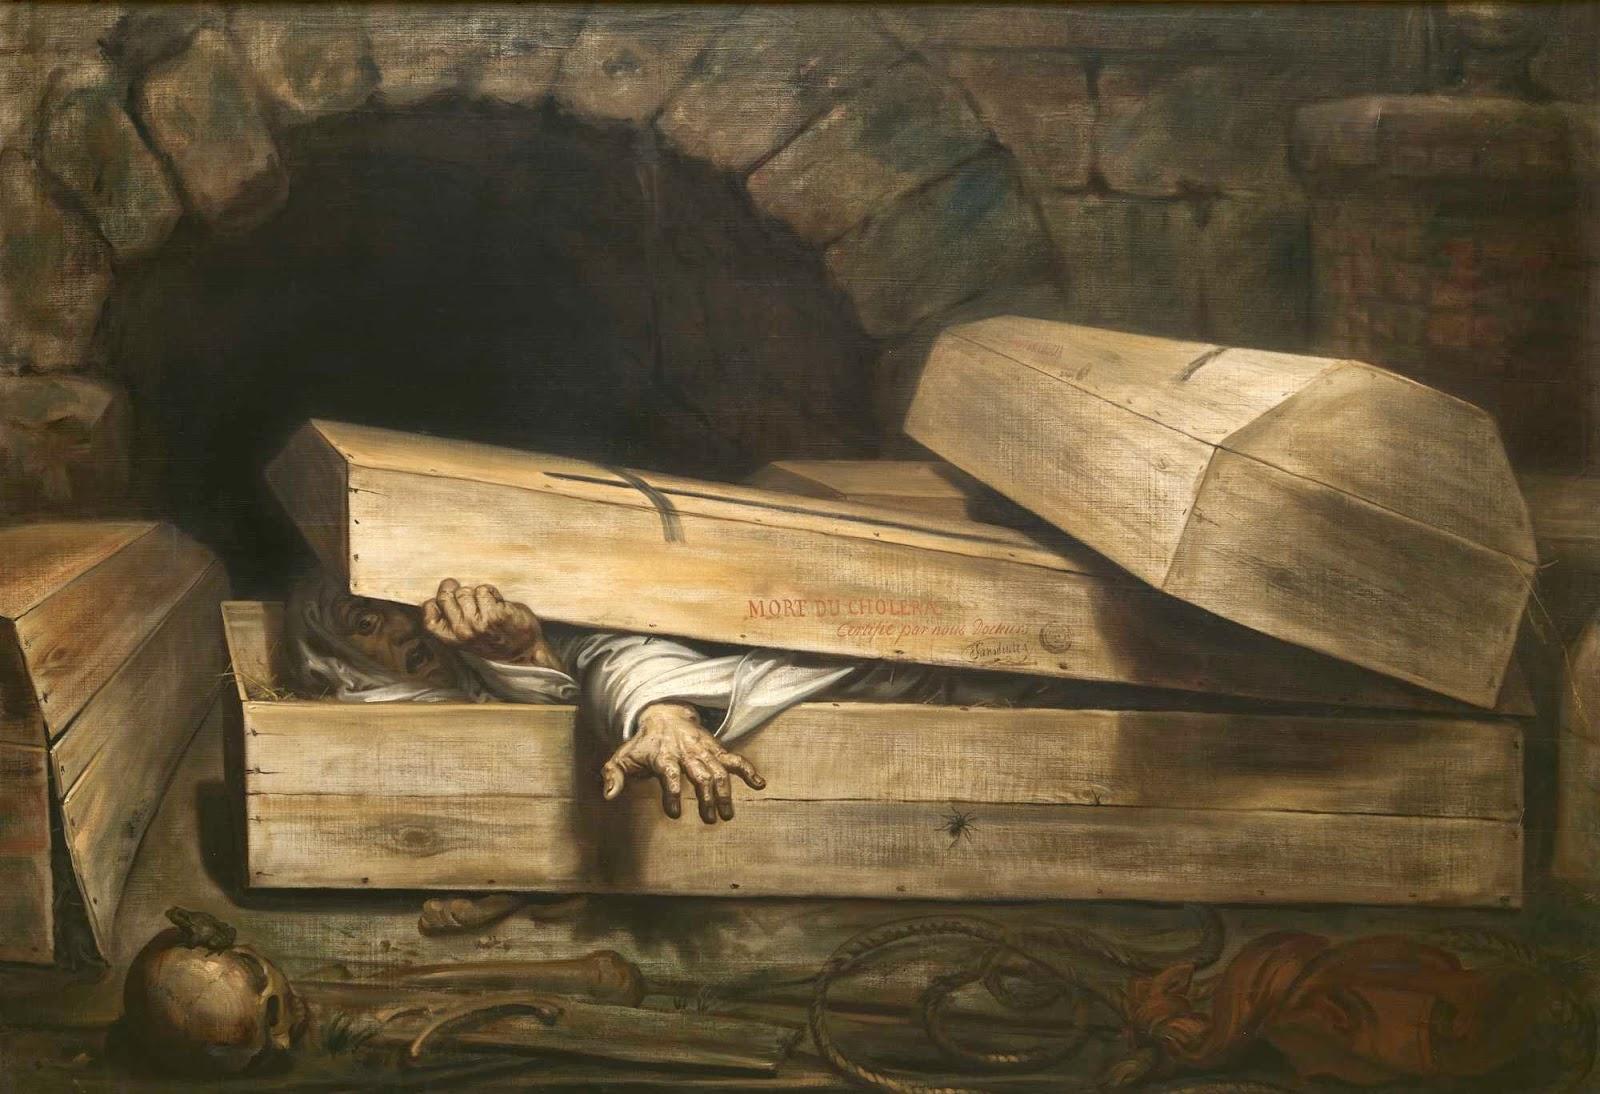 L'Inhumation précipitée (Antoine Wiertz - 1854)